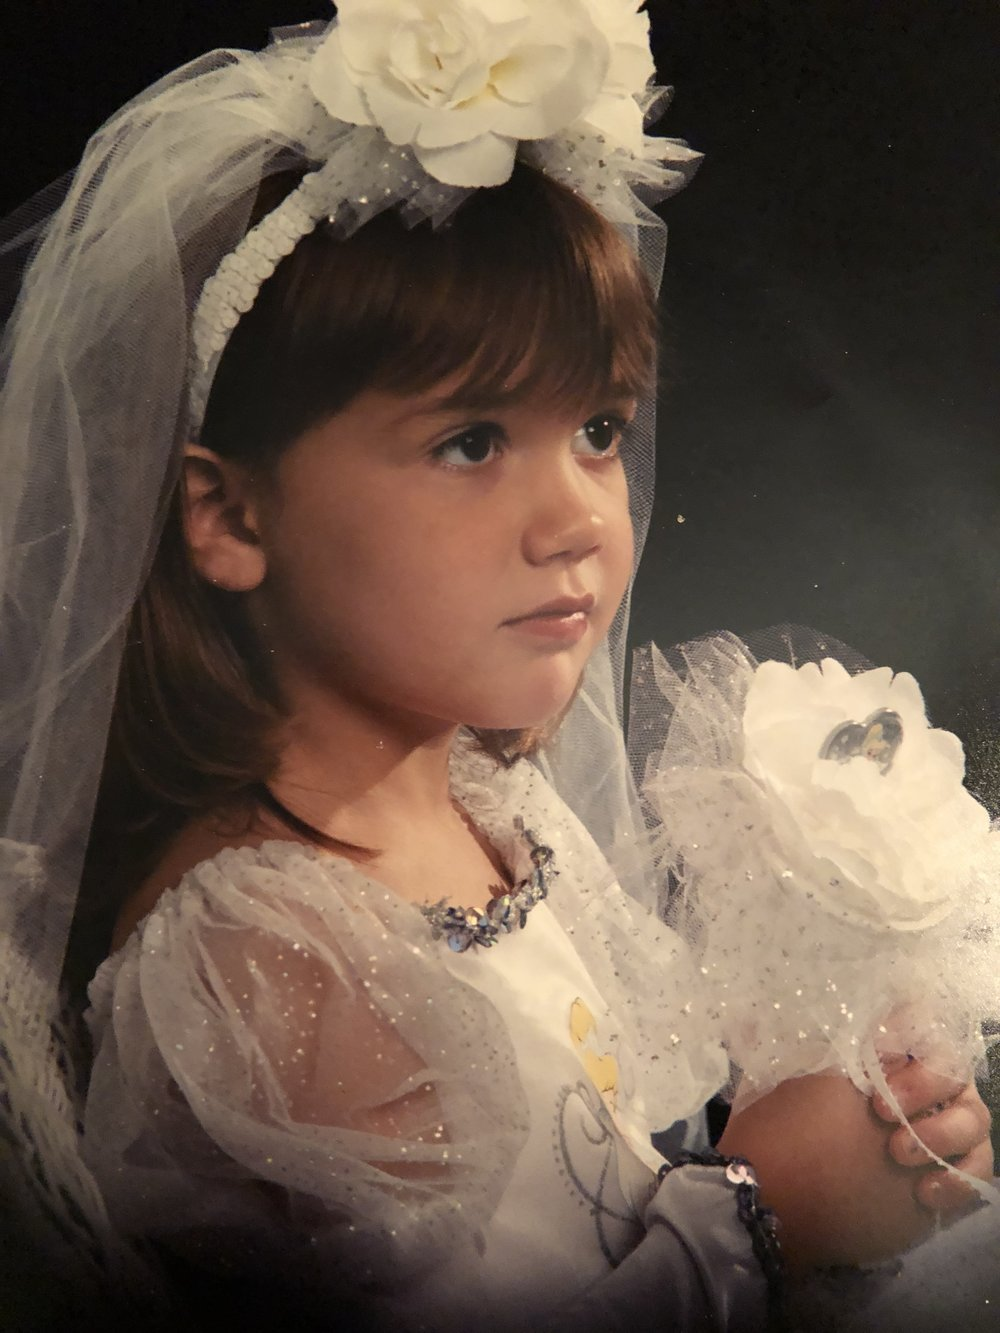 Me as Cinderella. One of my favorite princesses!